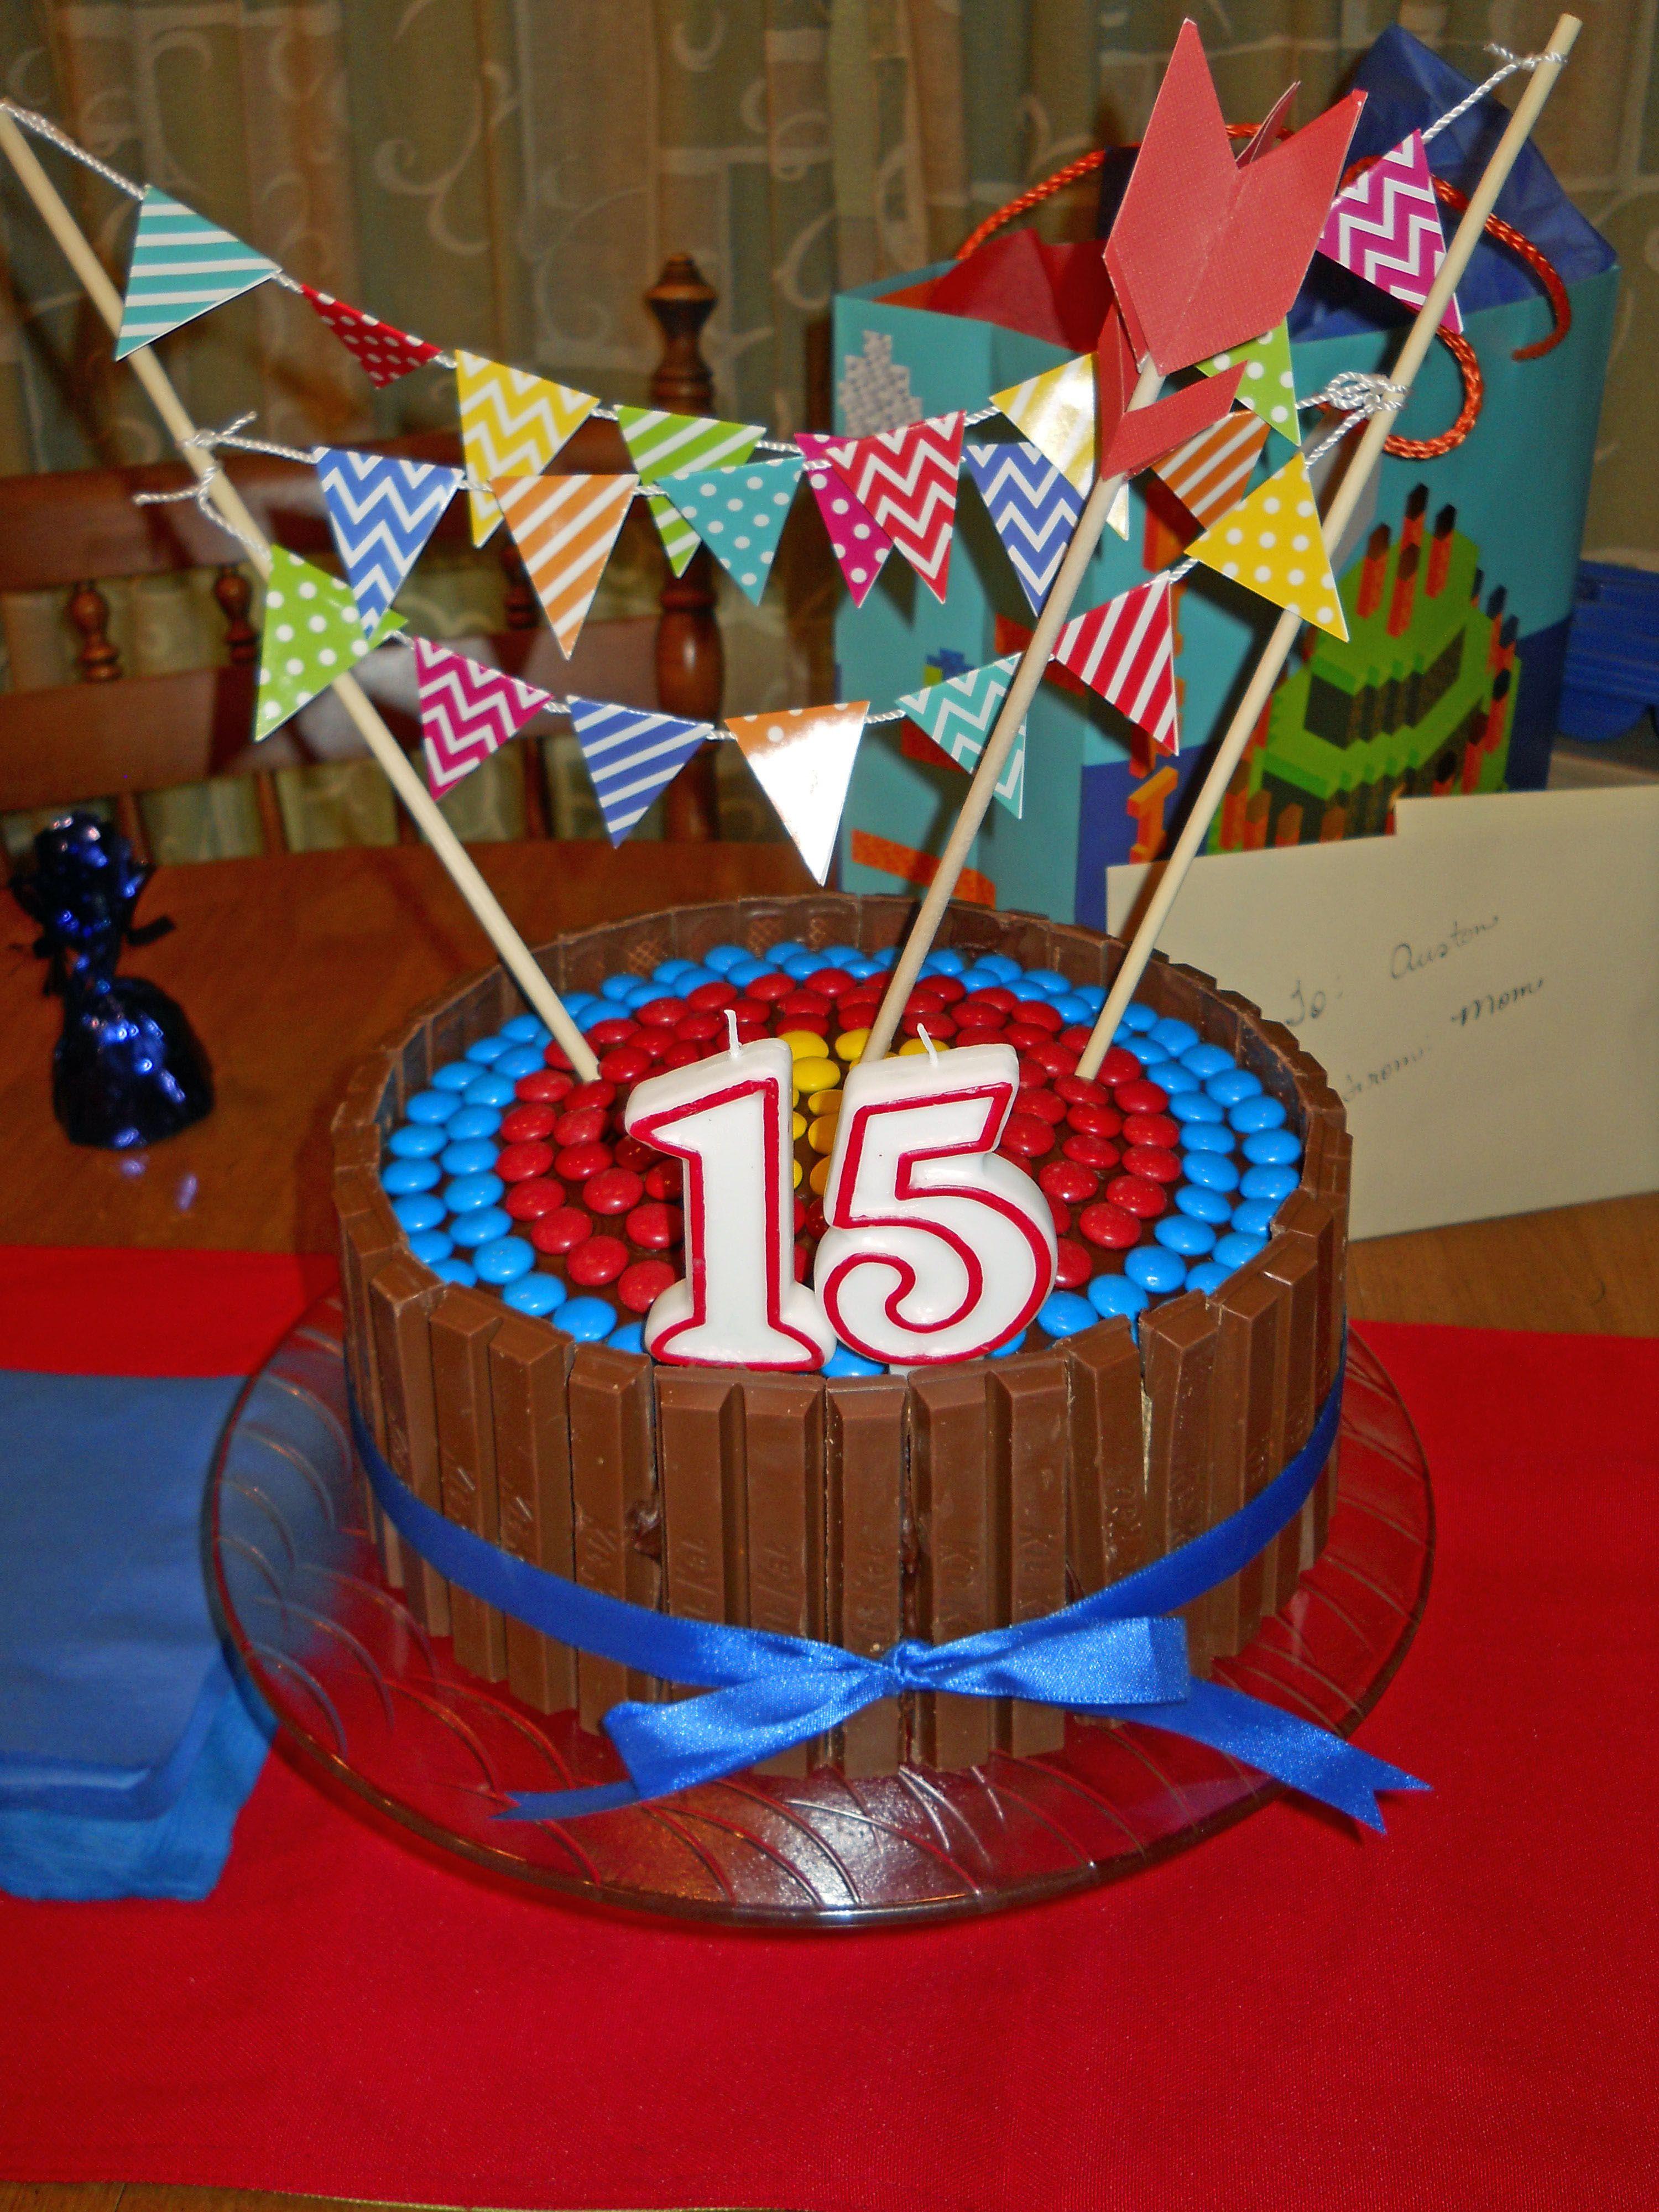 Archery kitkat cake with images kit kat cake cake